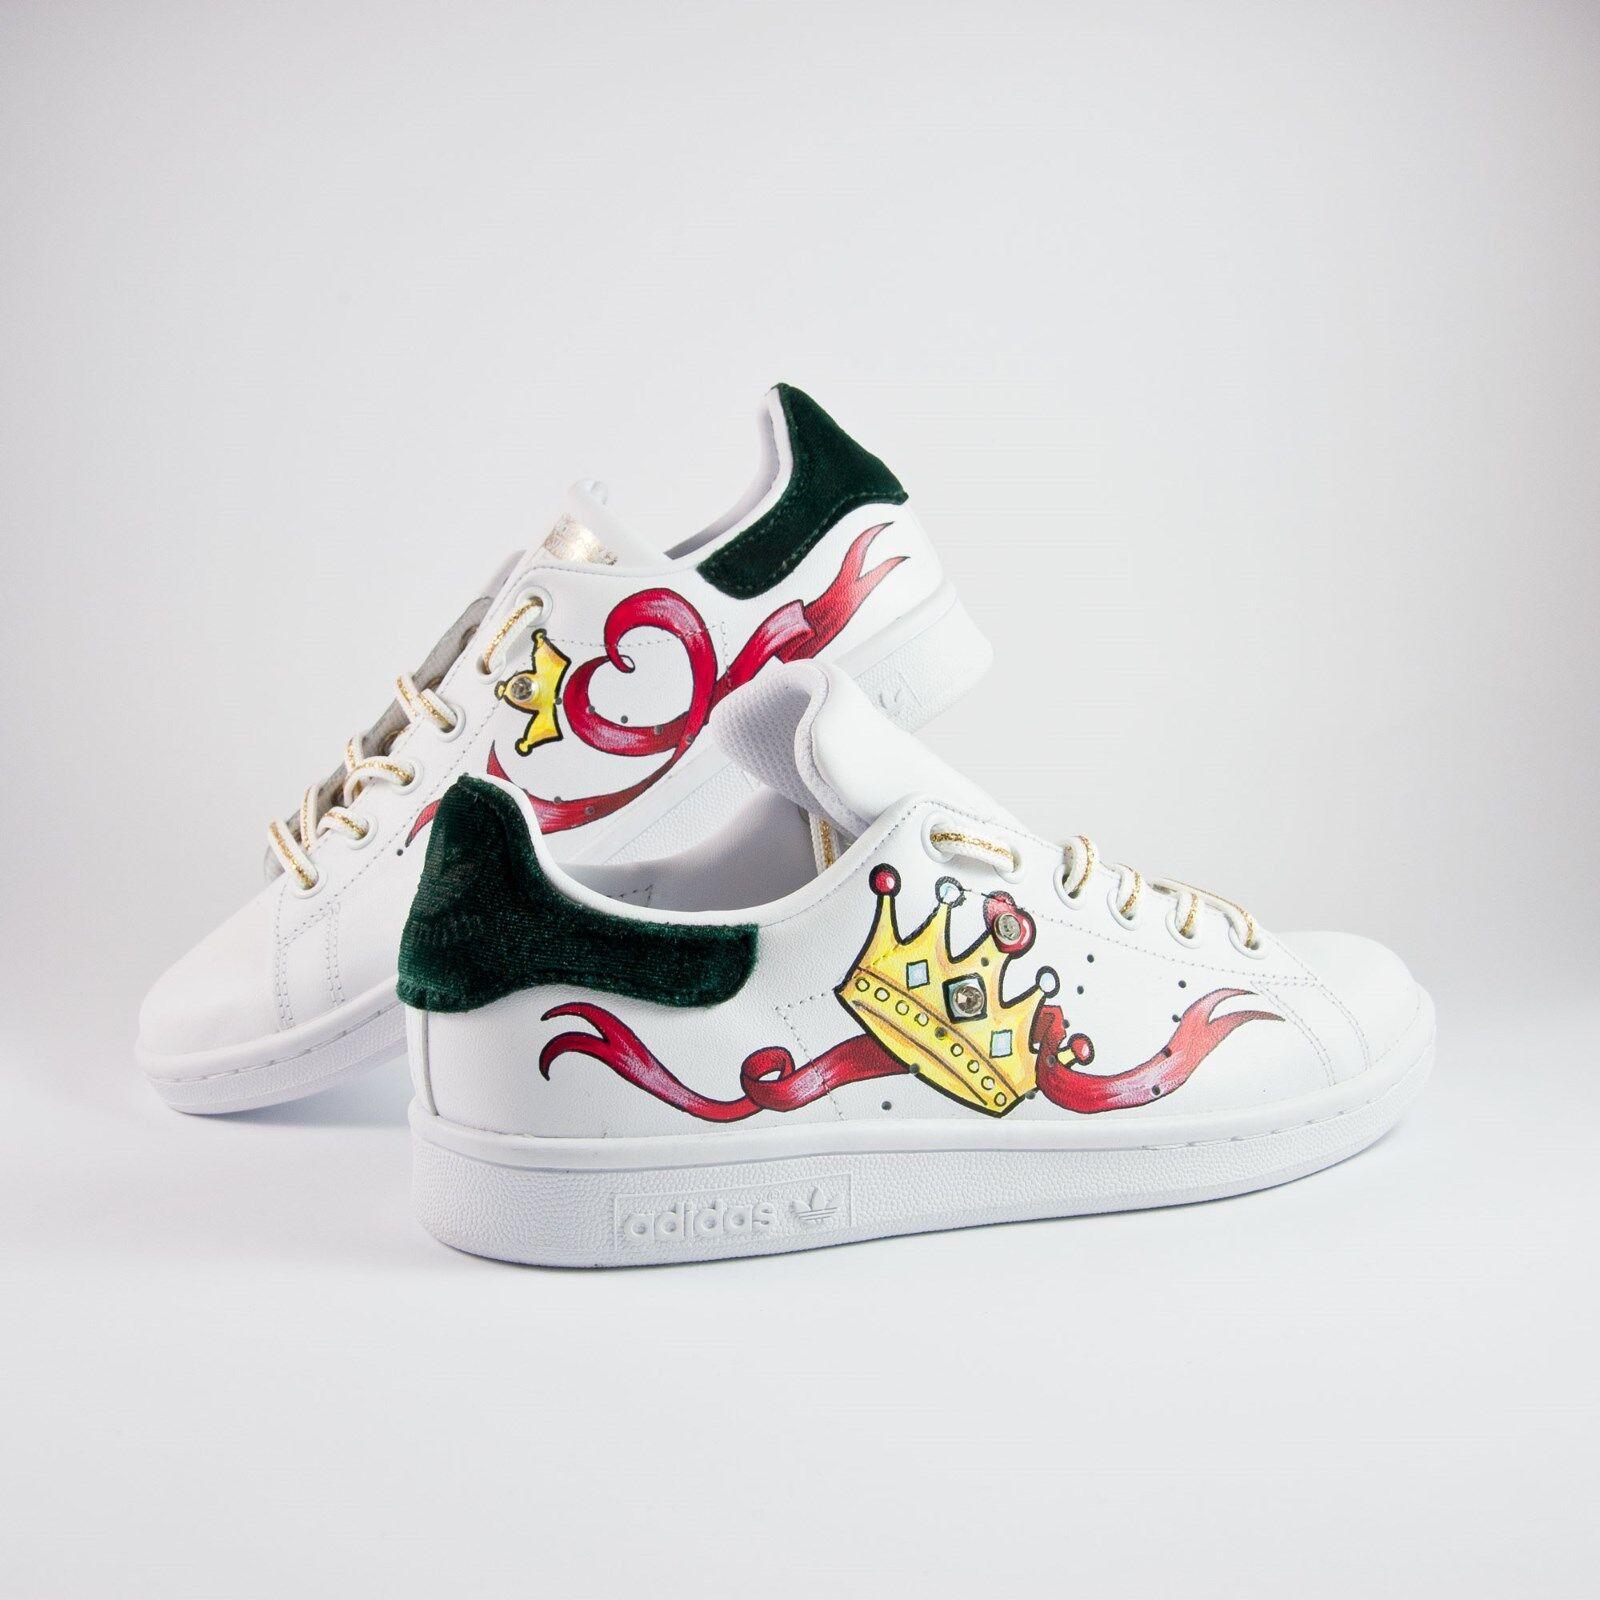 adidas smith verde